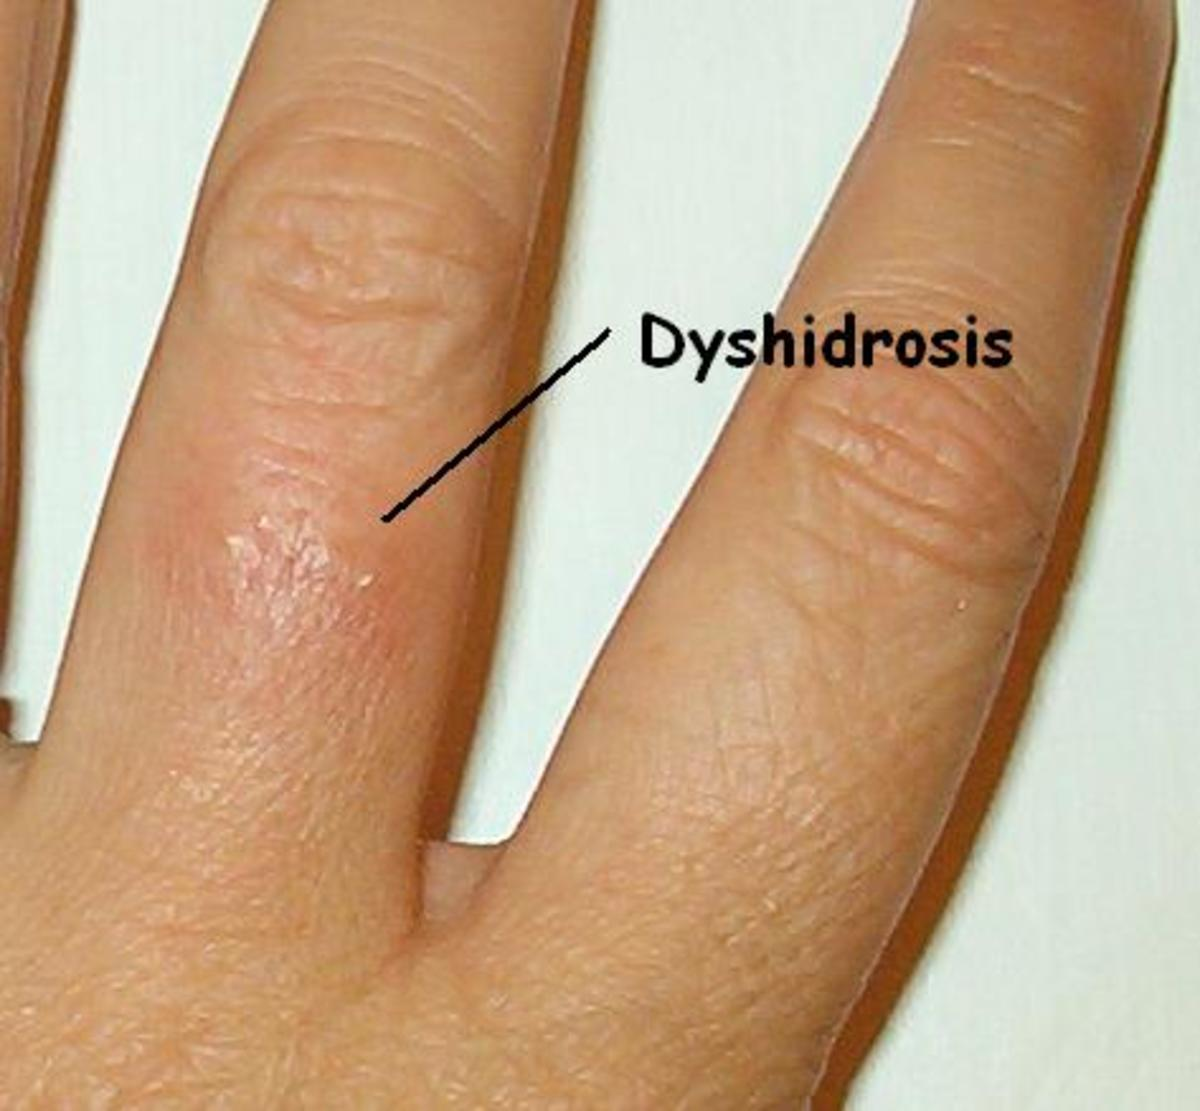 type=Dyshidrosis